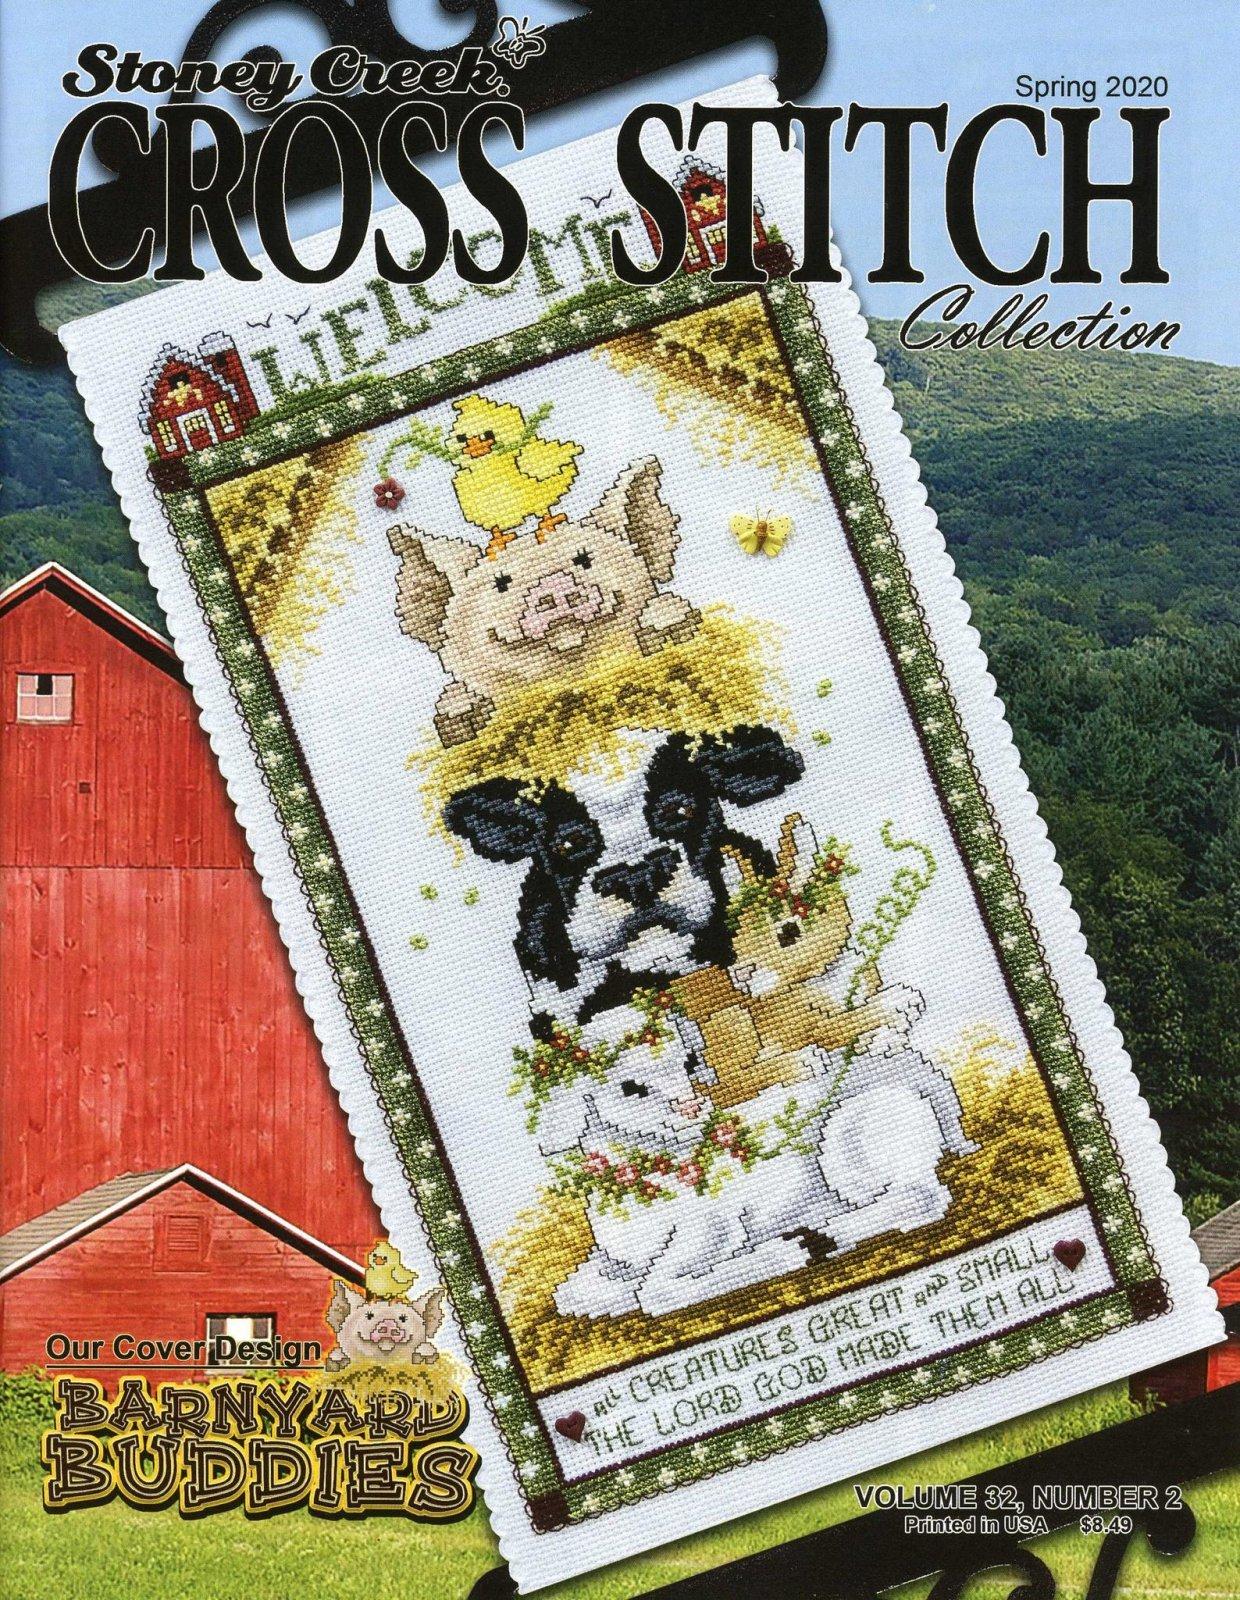 Stoney Creek Cross Stitch Spring 2020 Magazine